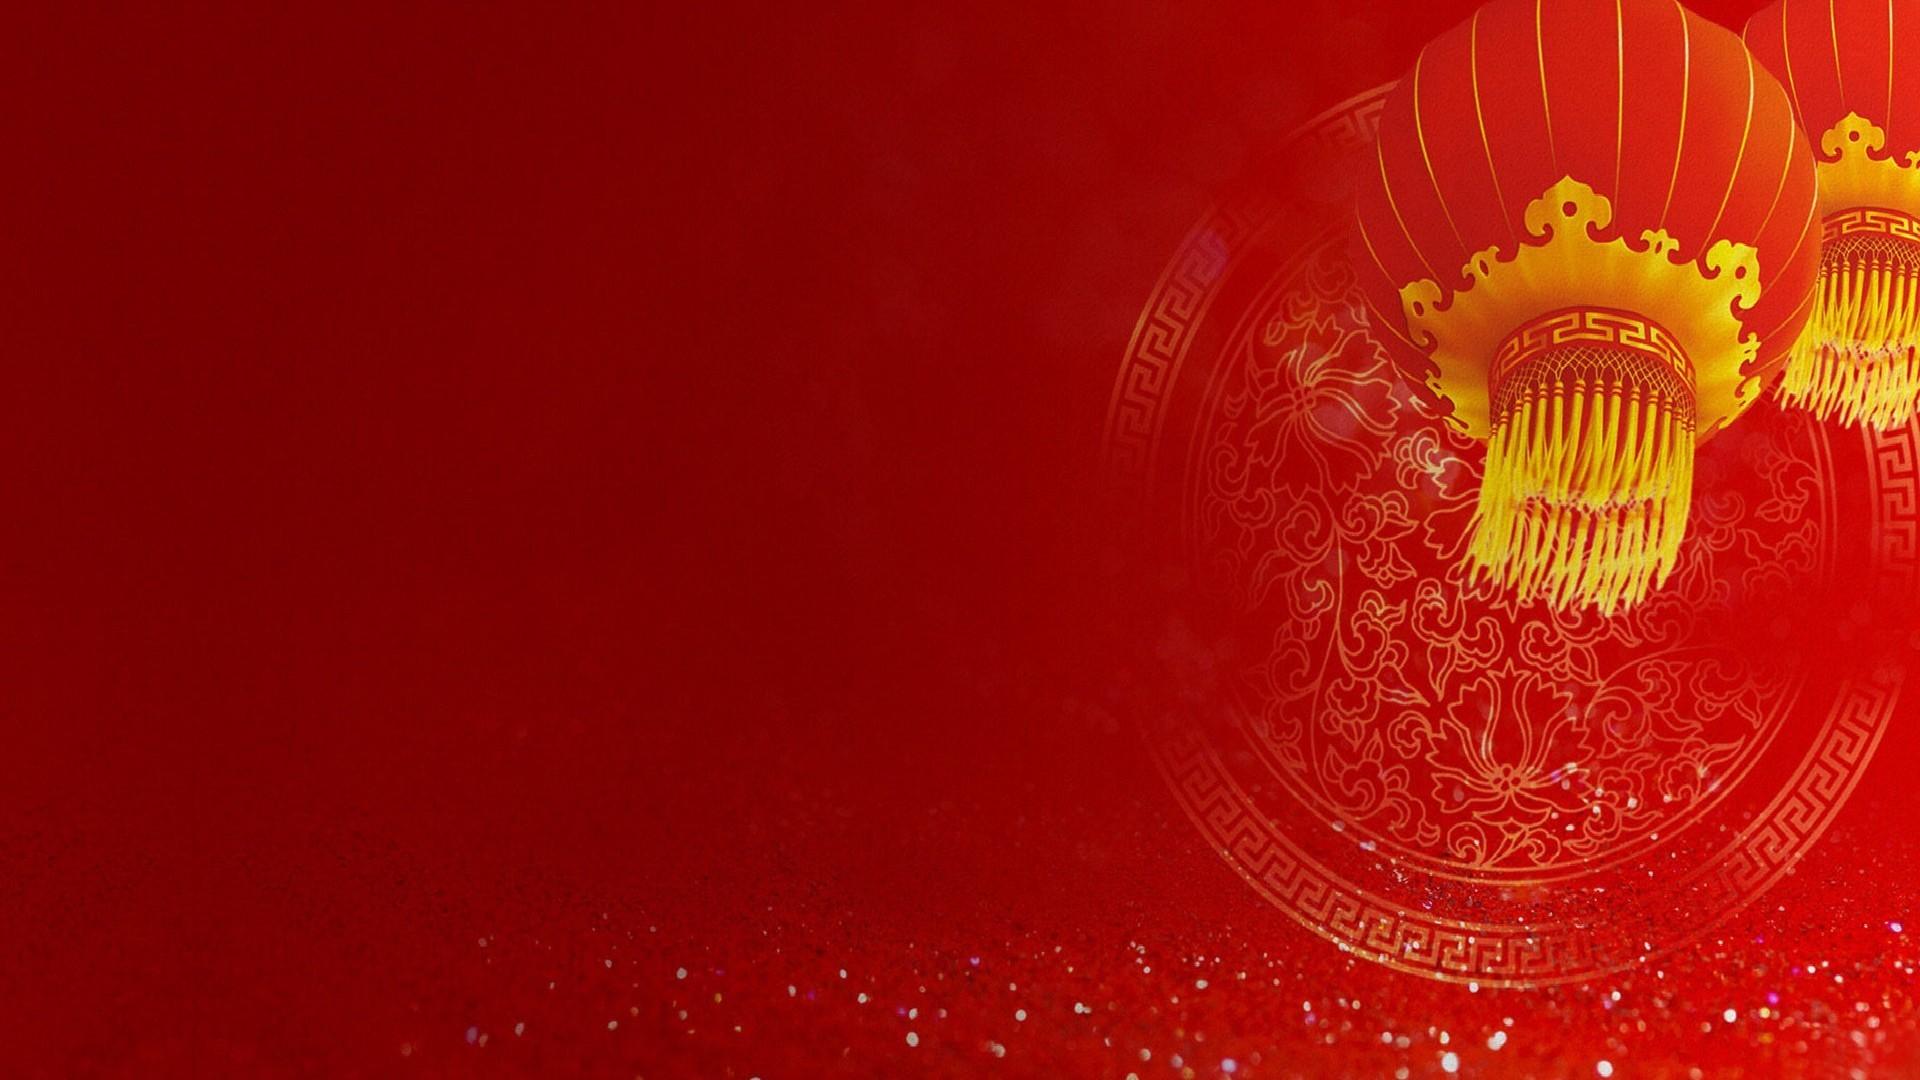 Chinese New Year 2016 Desktop Wallpaper